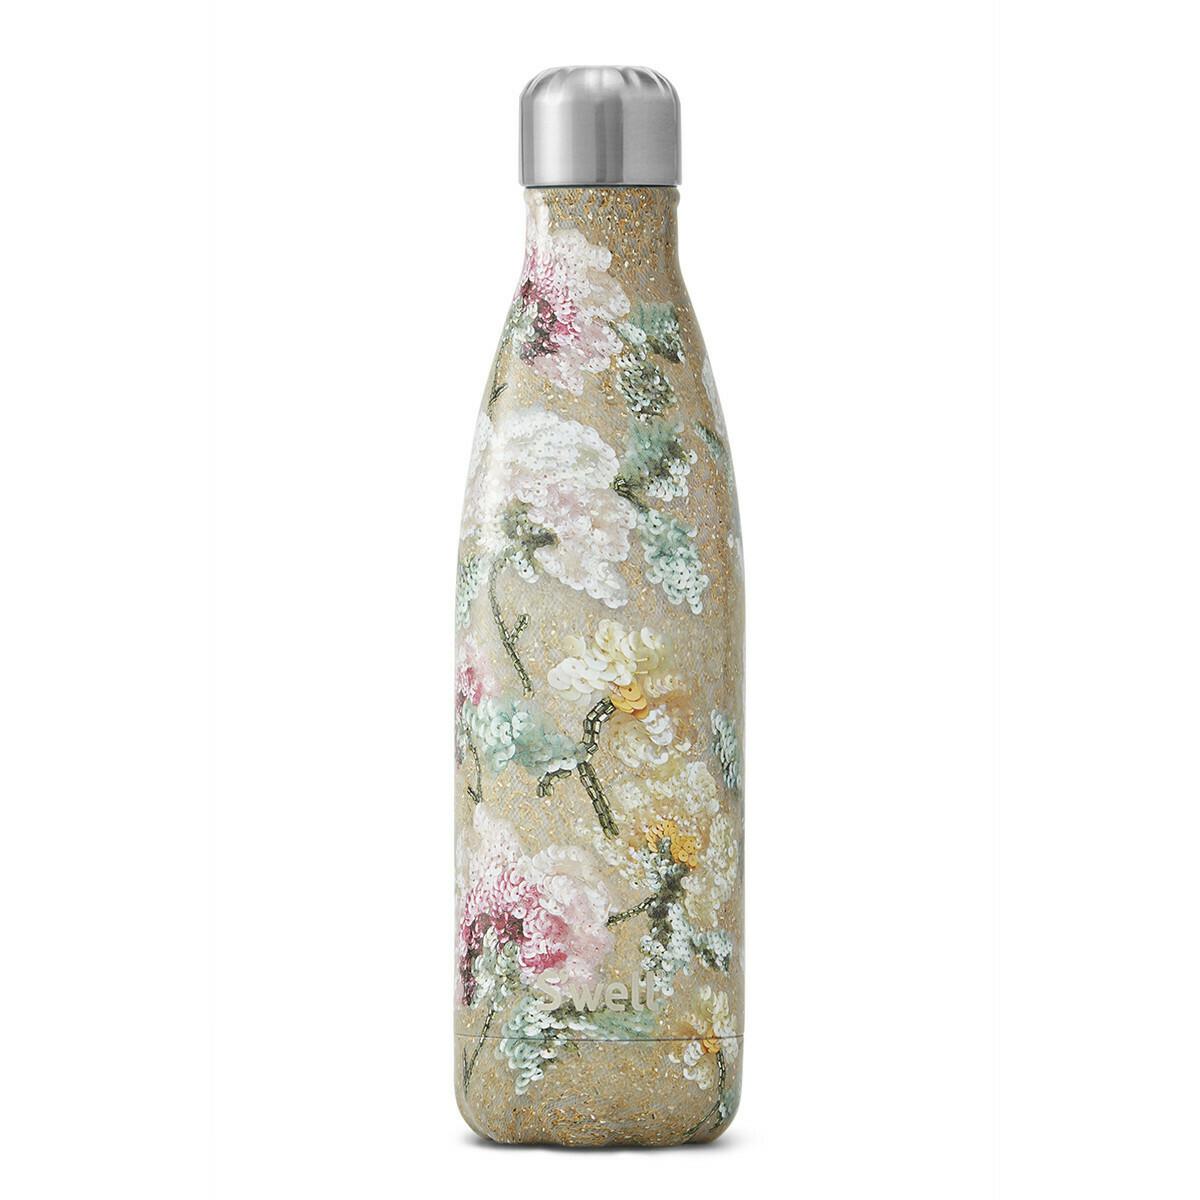 Stainless Steel Bottle - Vintage Rose